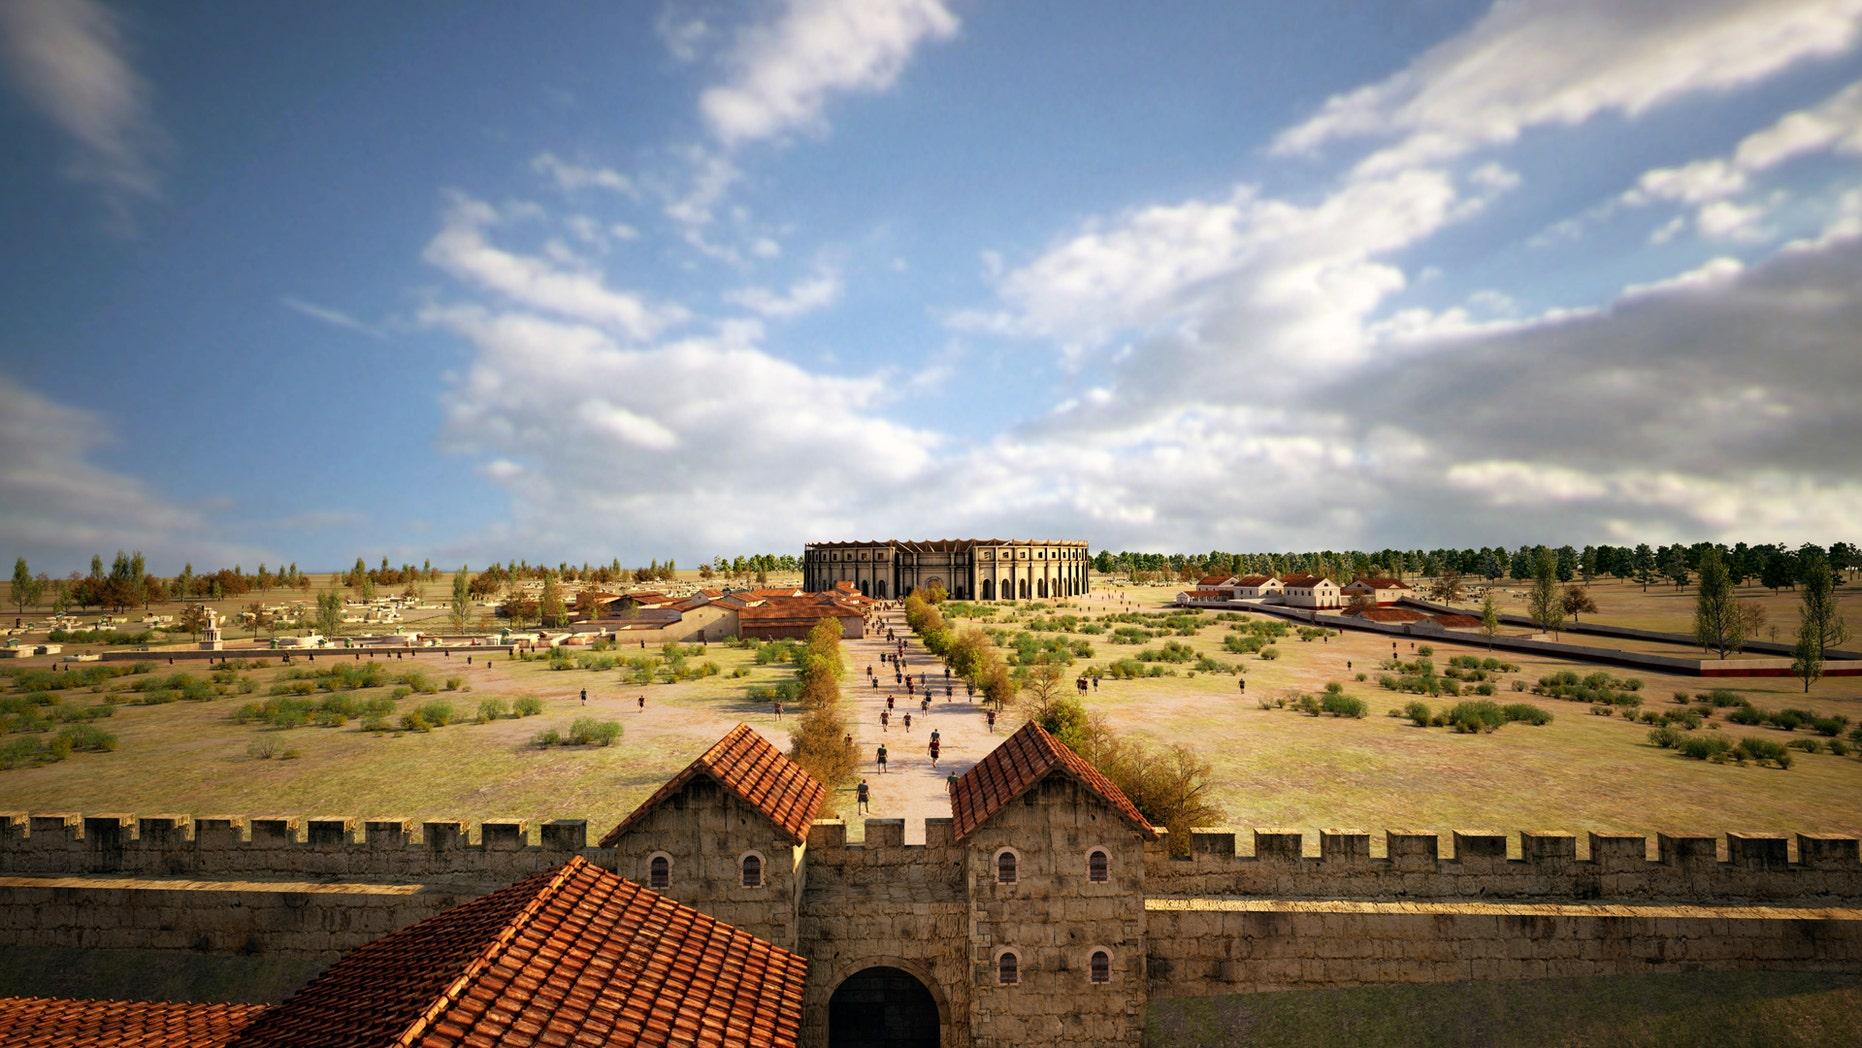 A visualization of Carnuntum's taverns, amphitheater and gladiator school (LBI ArchPro, 7reasons).